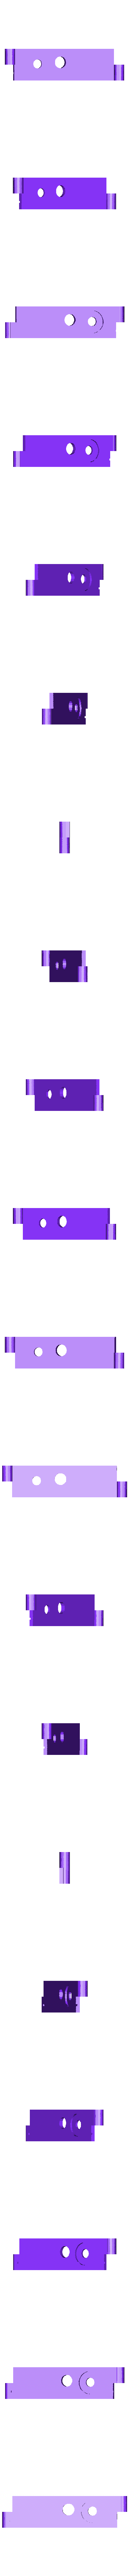 av3.stl Download free SCAD file Modular raspberry pi case • 3D print object, Lassaalk